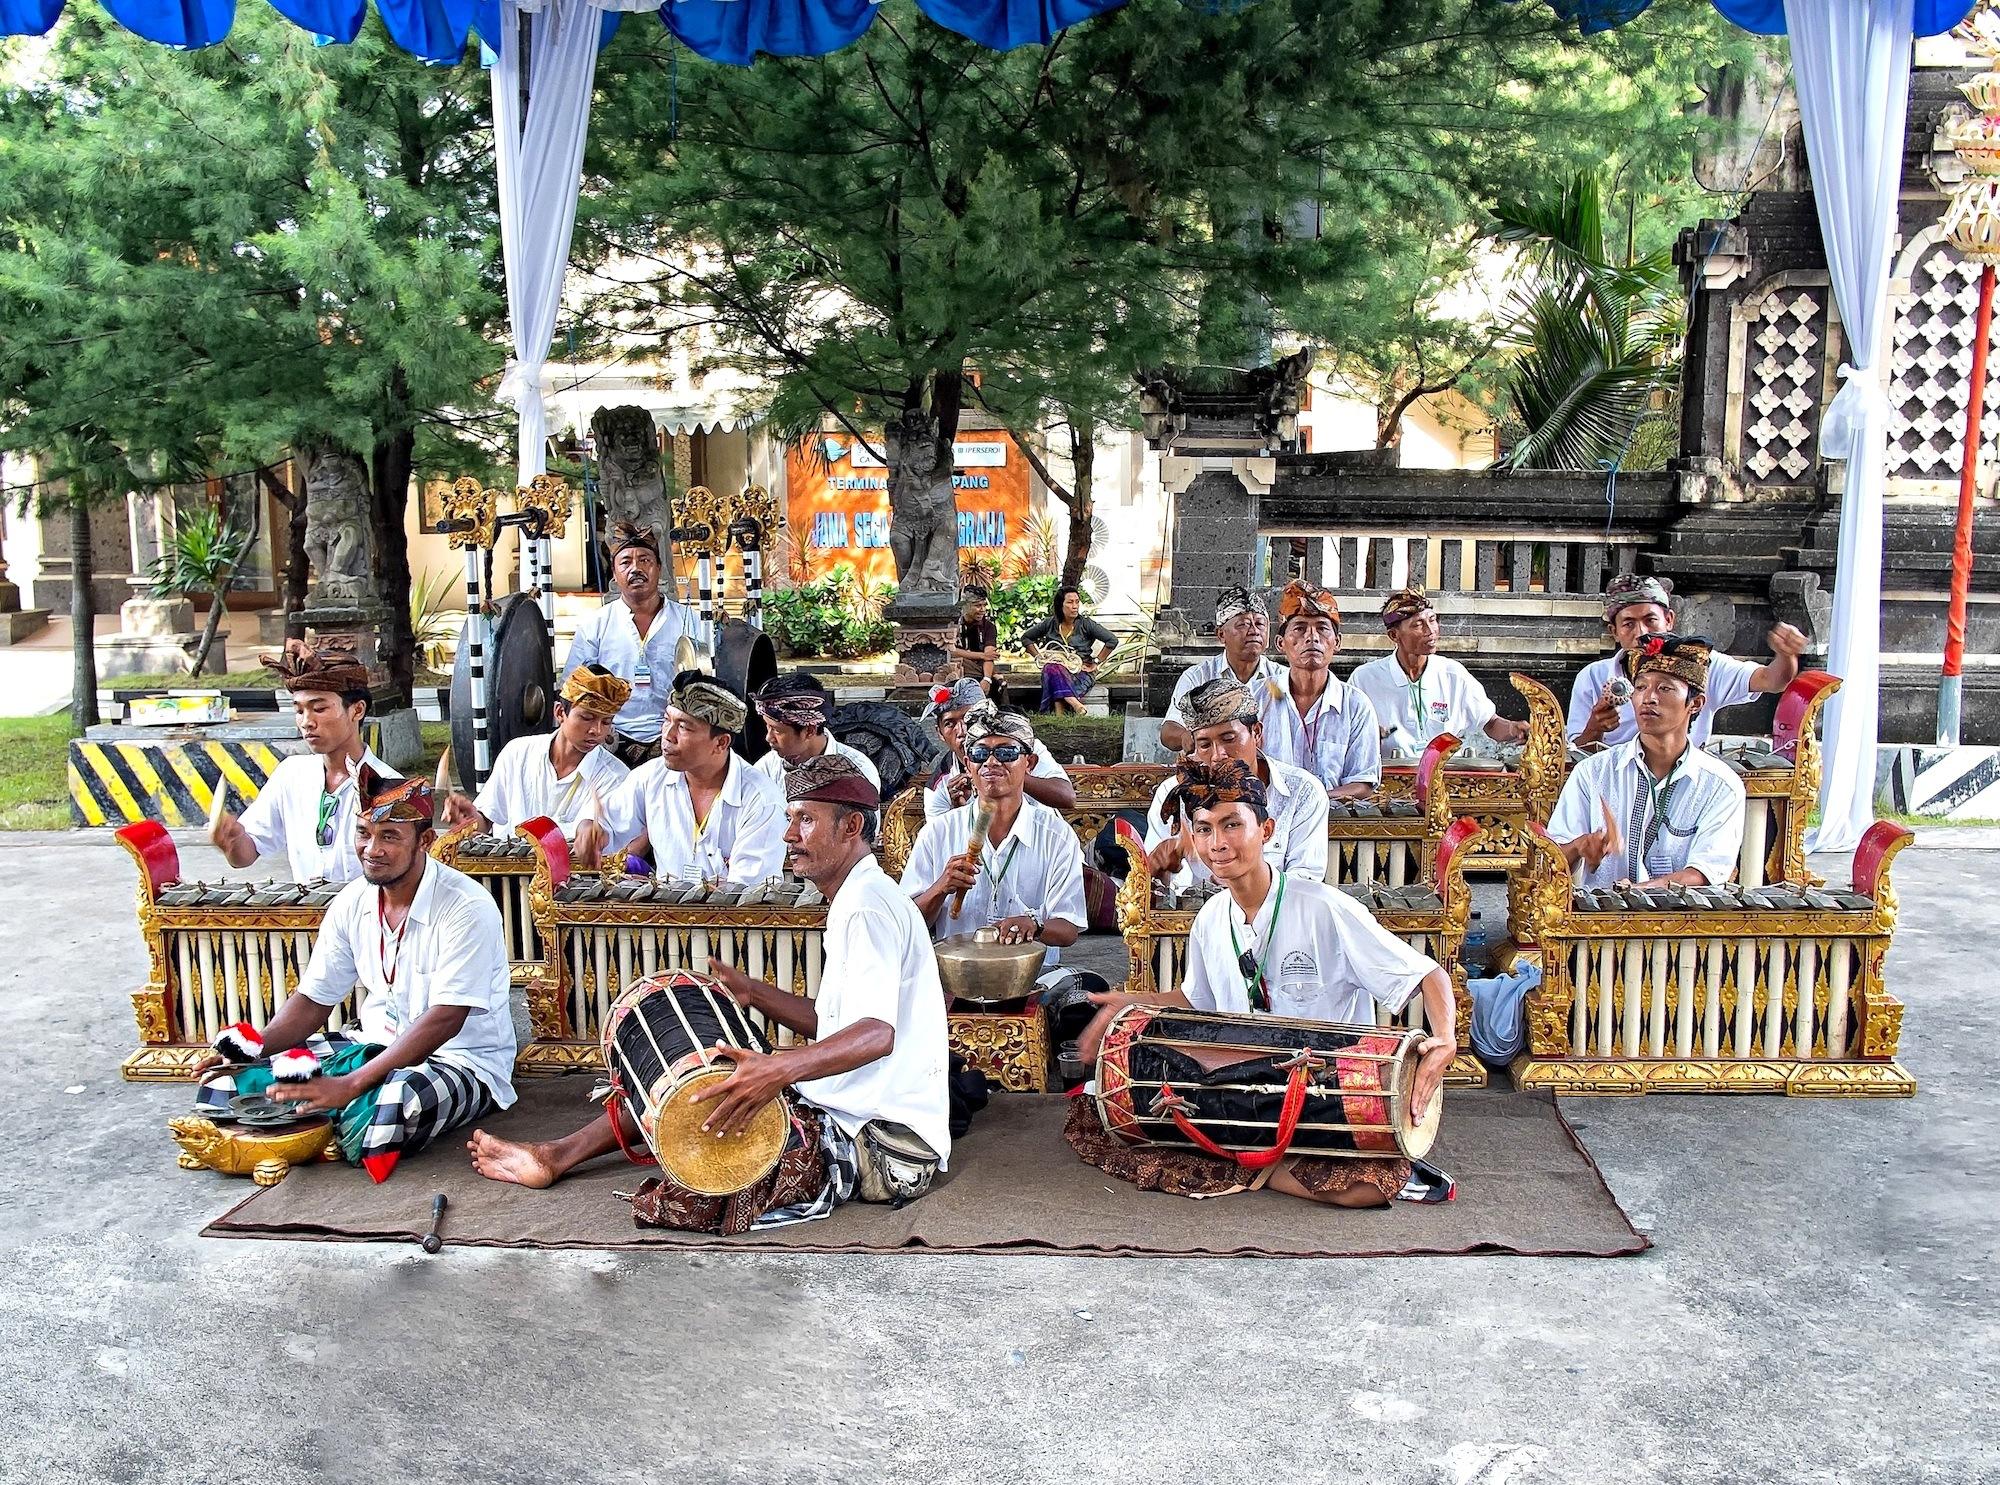 Bali Street Band